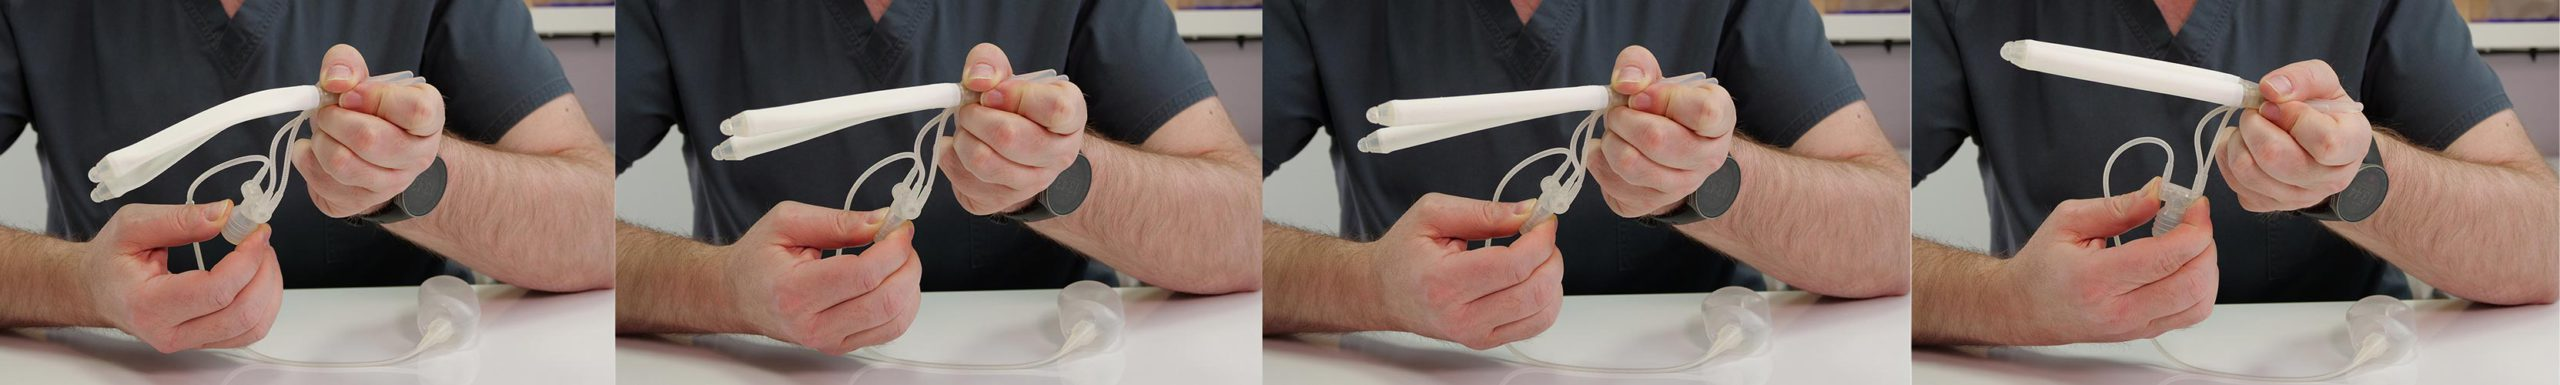 Implant prącia -wzwód